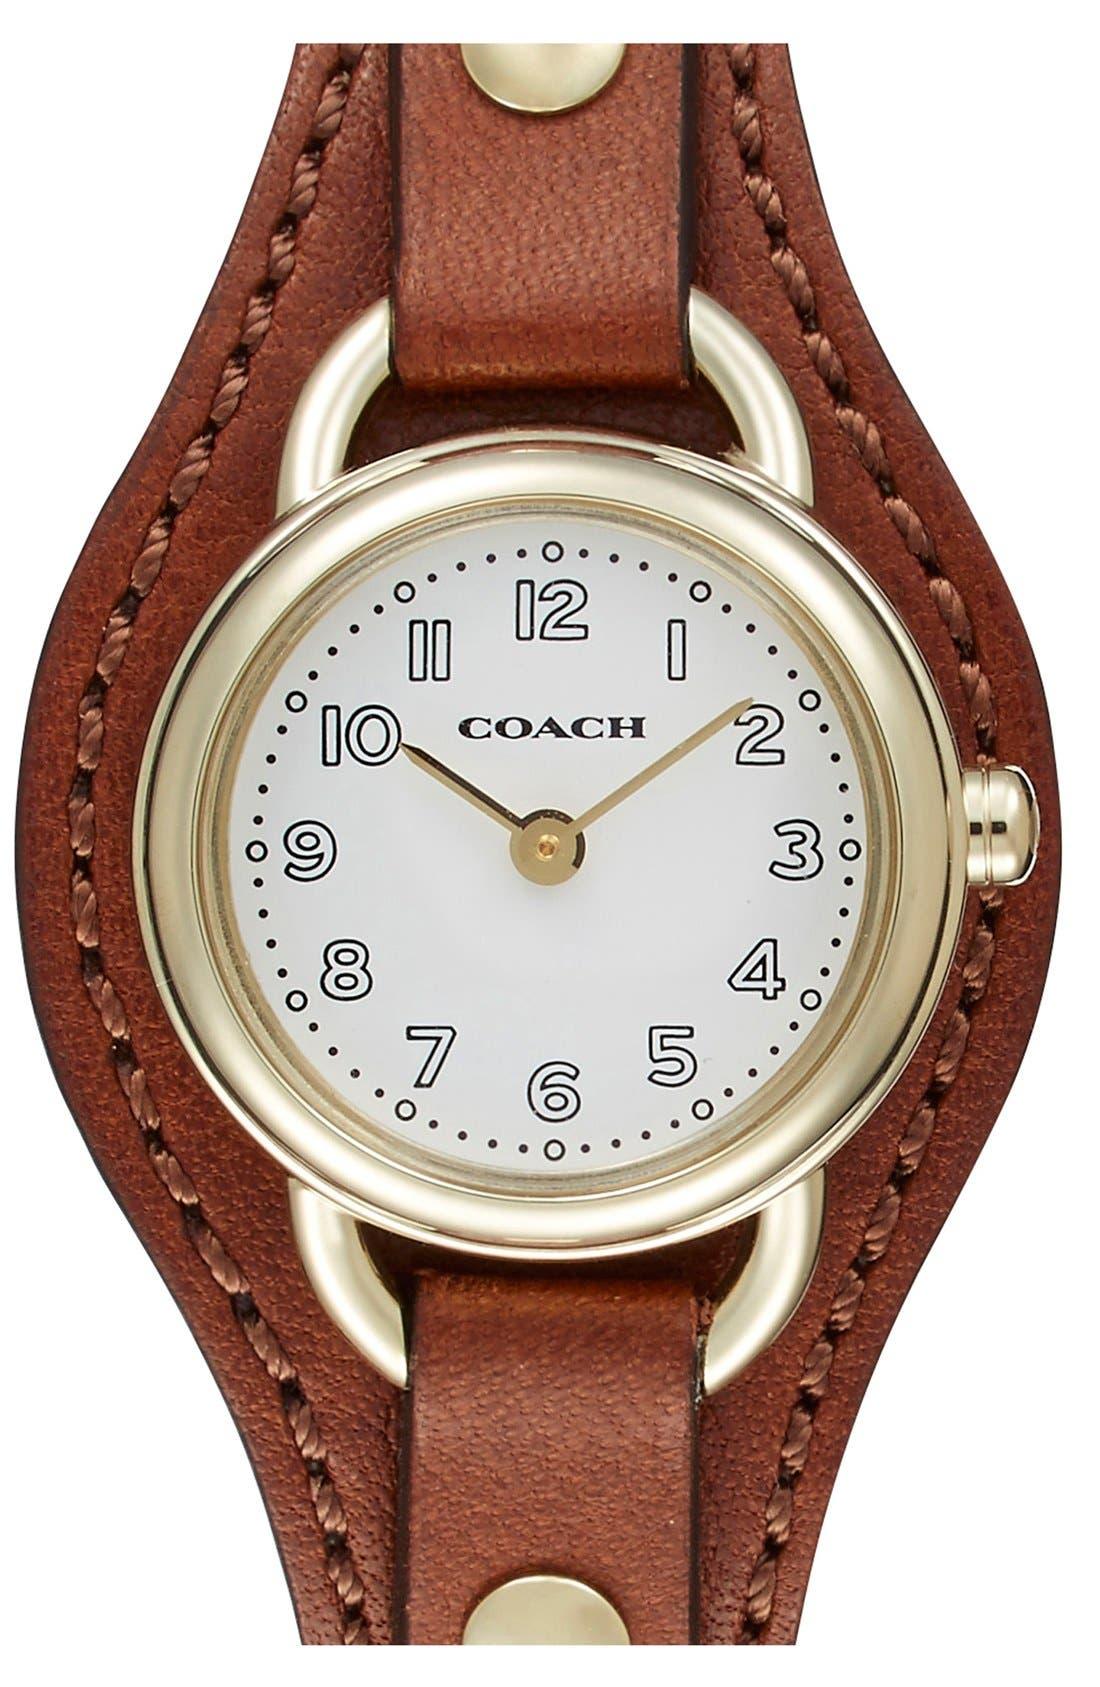 Main Image - COACH 'Dree' Leather Cuff Watch, 23mm